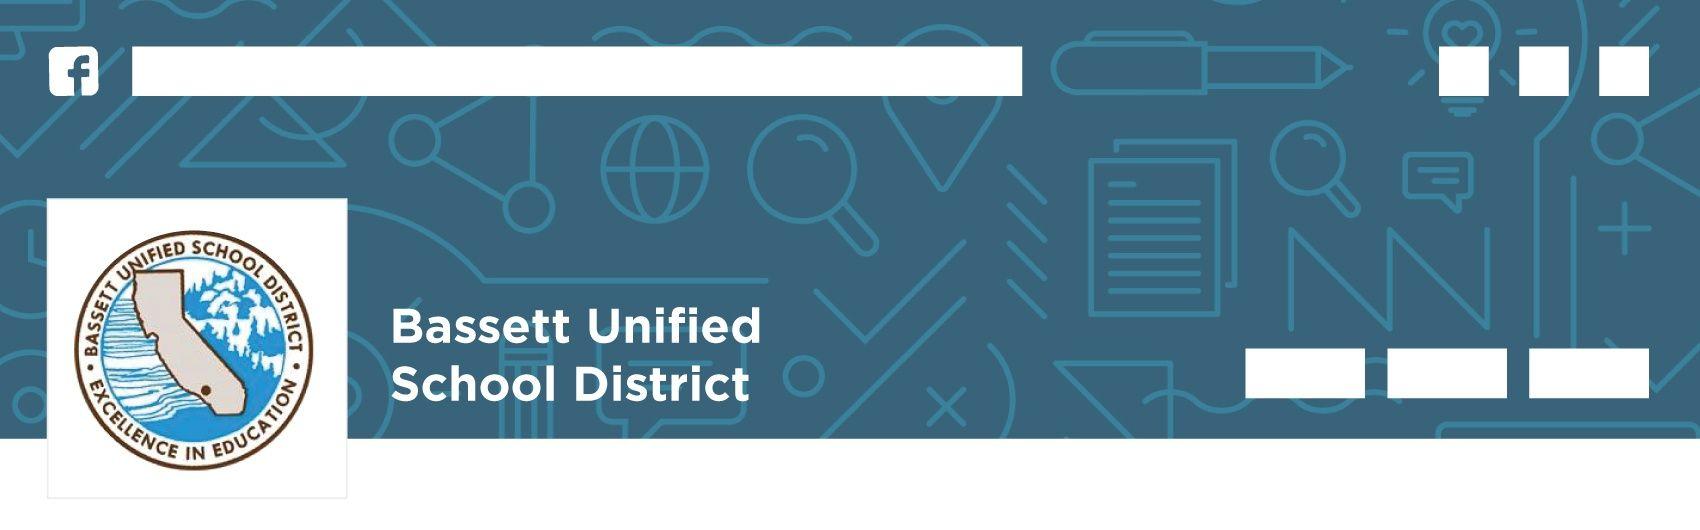 NEOGOV Facebook App Enhances Bassett Unified School District's Social Recruiting Capability